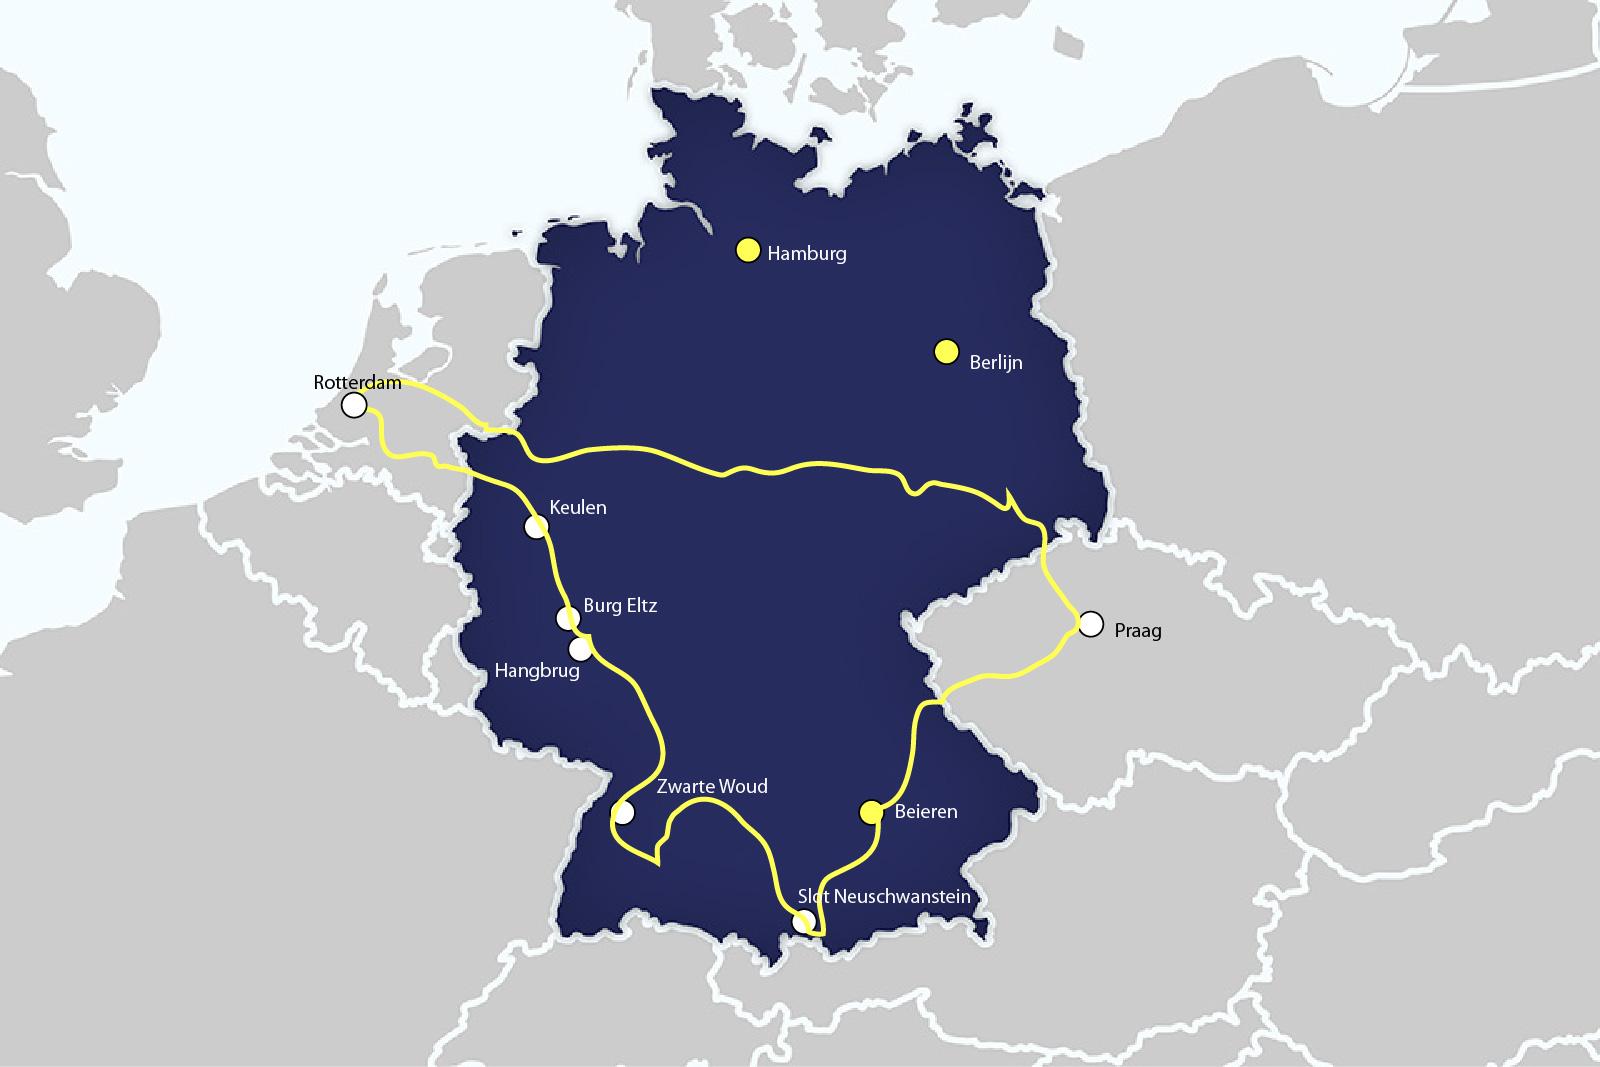 roadtrip duitsland - reisroute duitsland - atravelnote.nl